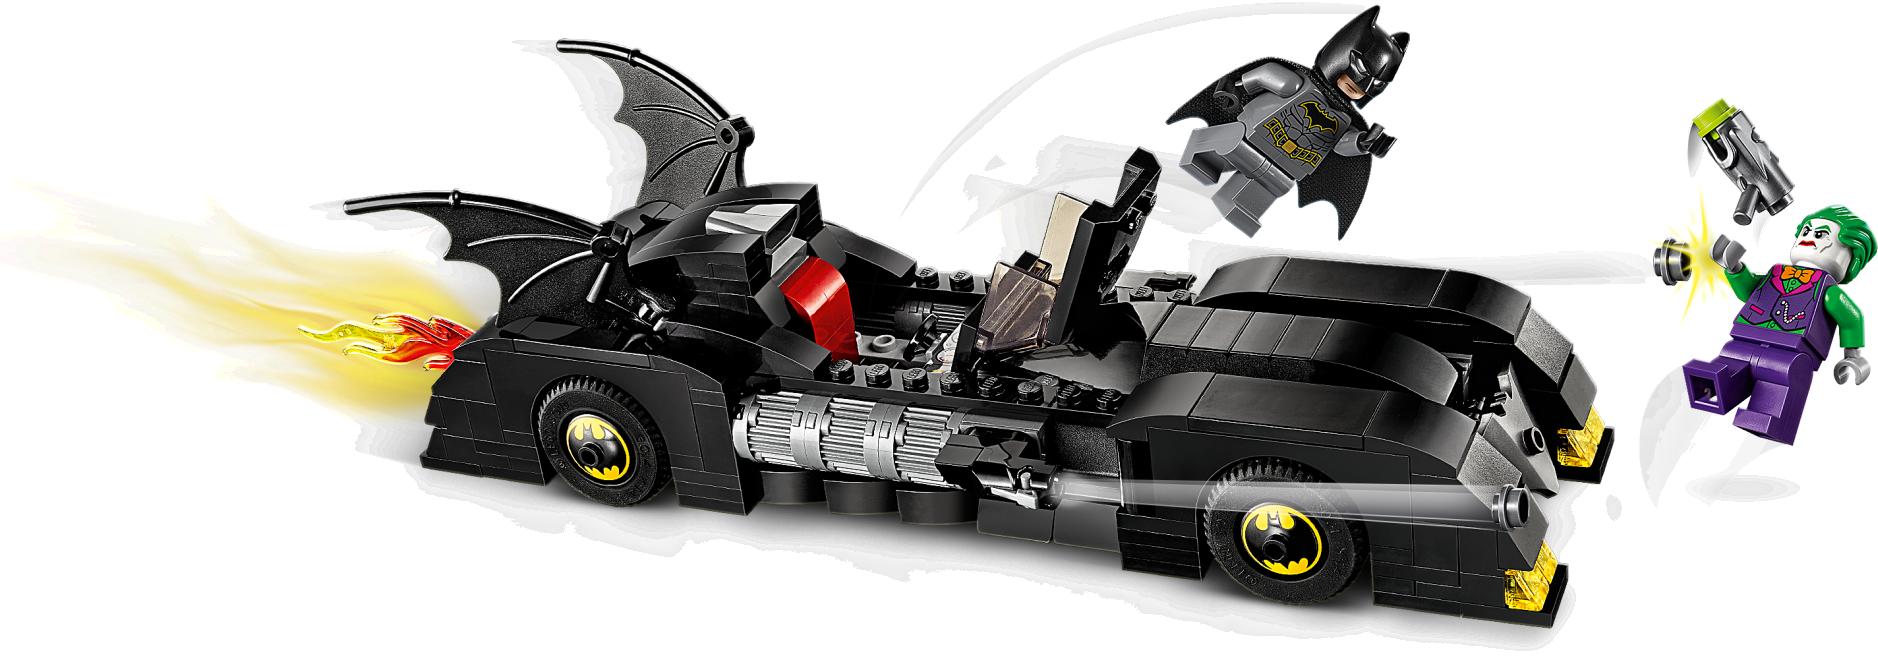 "Batmobile"": Pursuit of The Joker"""